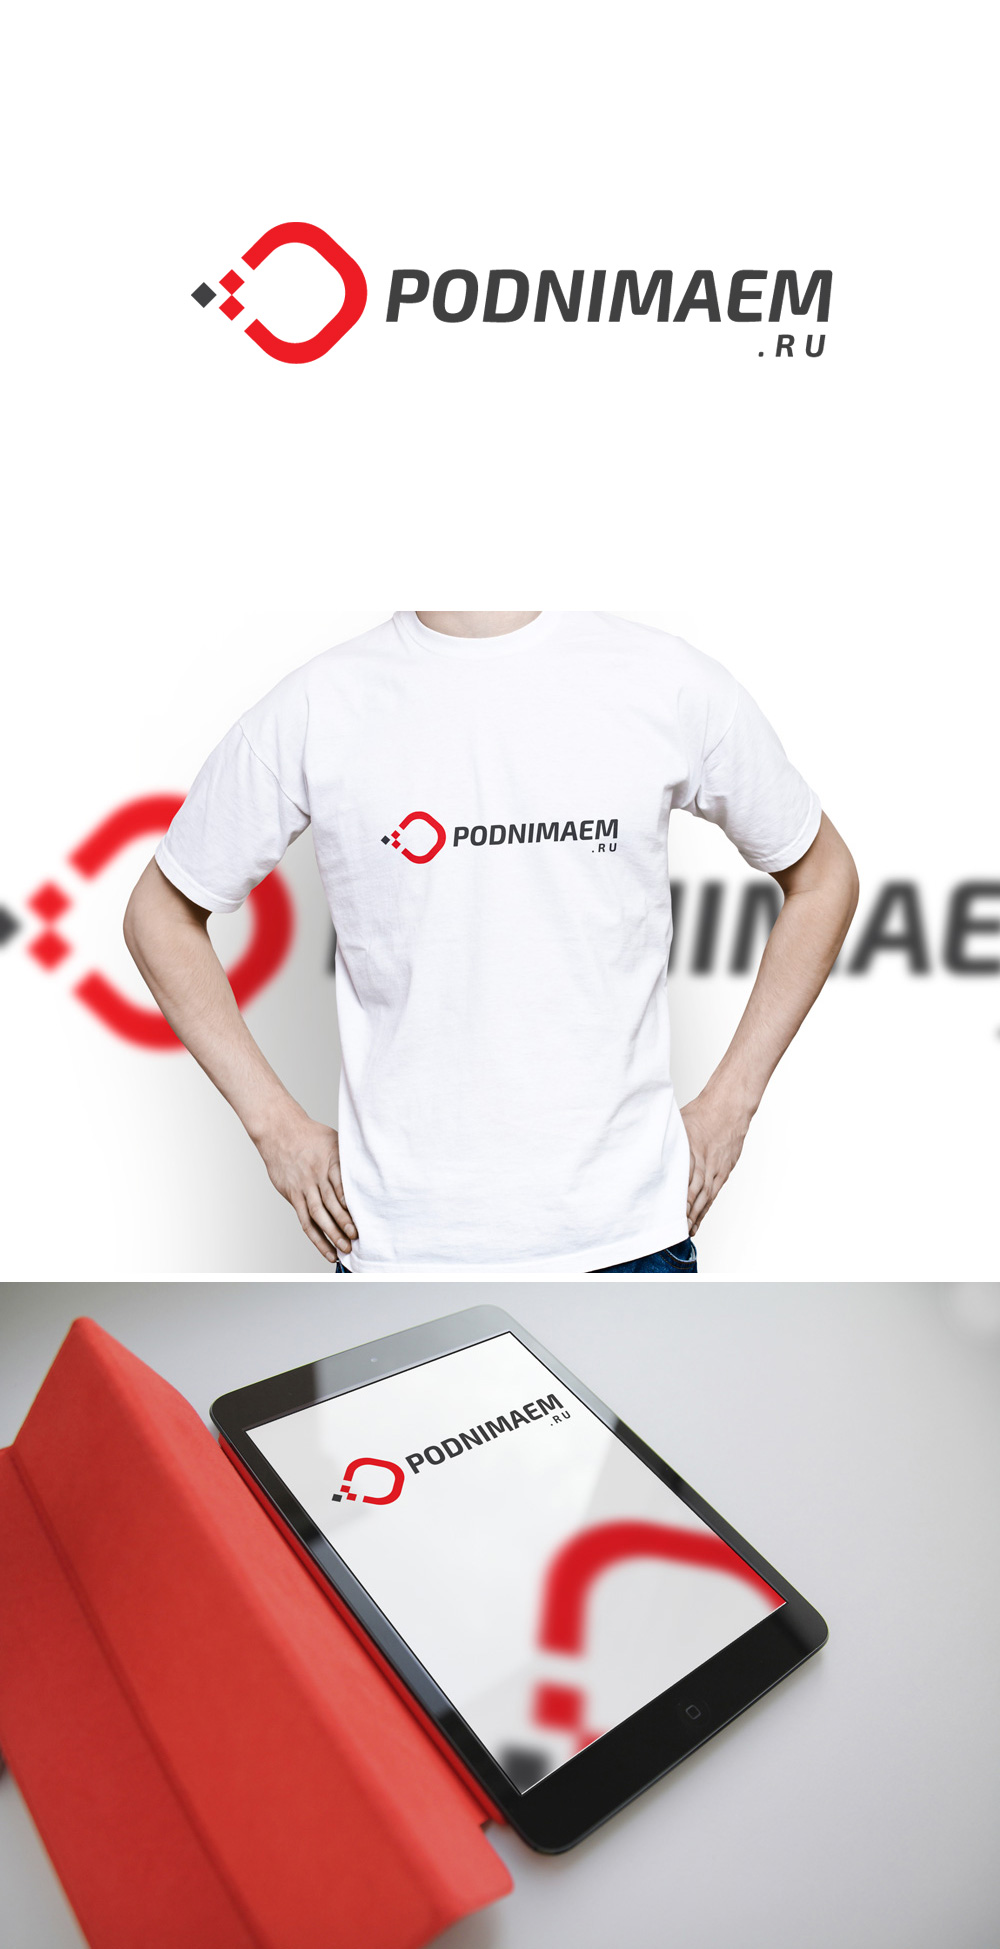 Разработать логотип + визитку + логотип для печати ООО +++ фото f_62855475ea9780e0.jpg